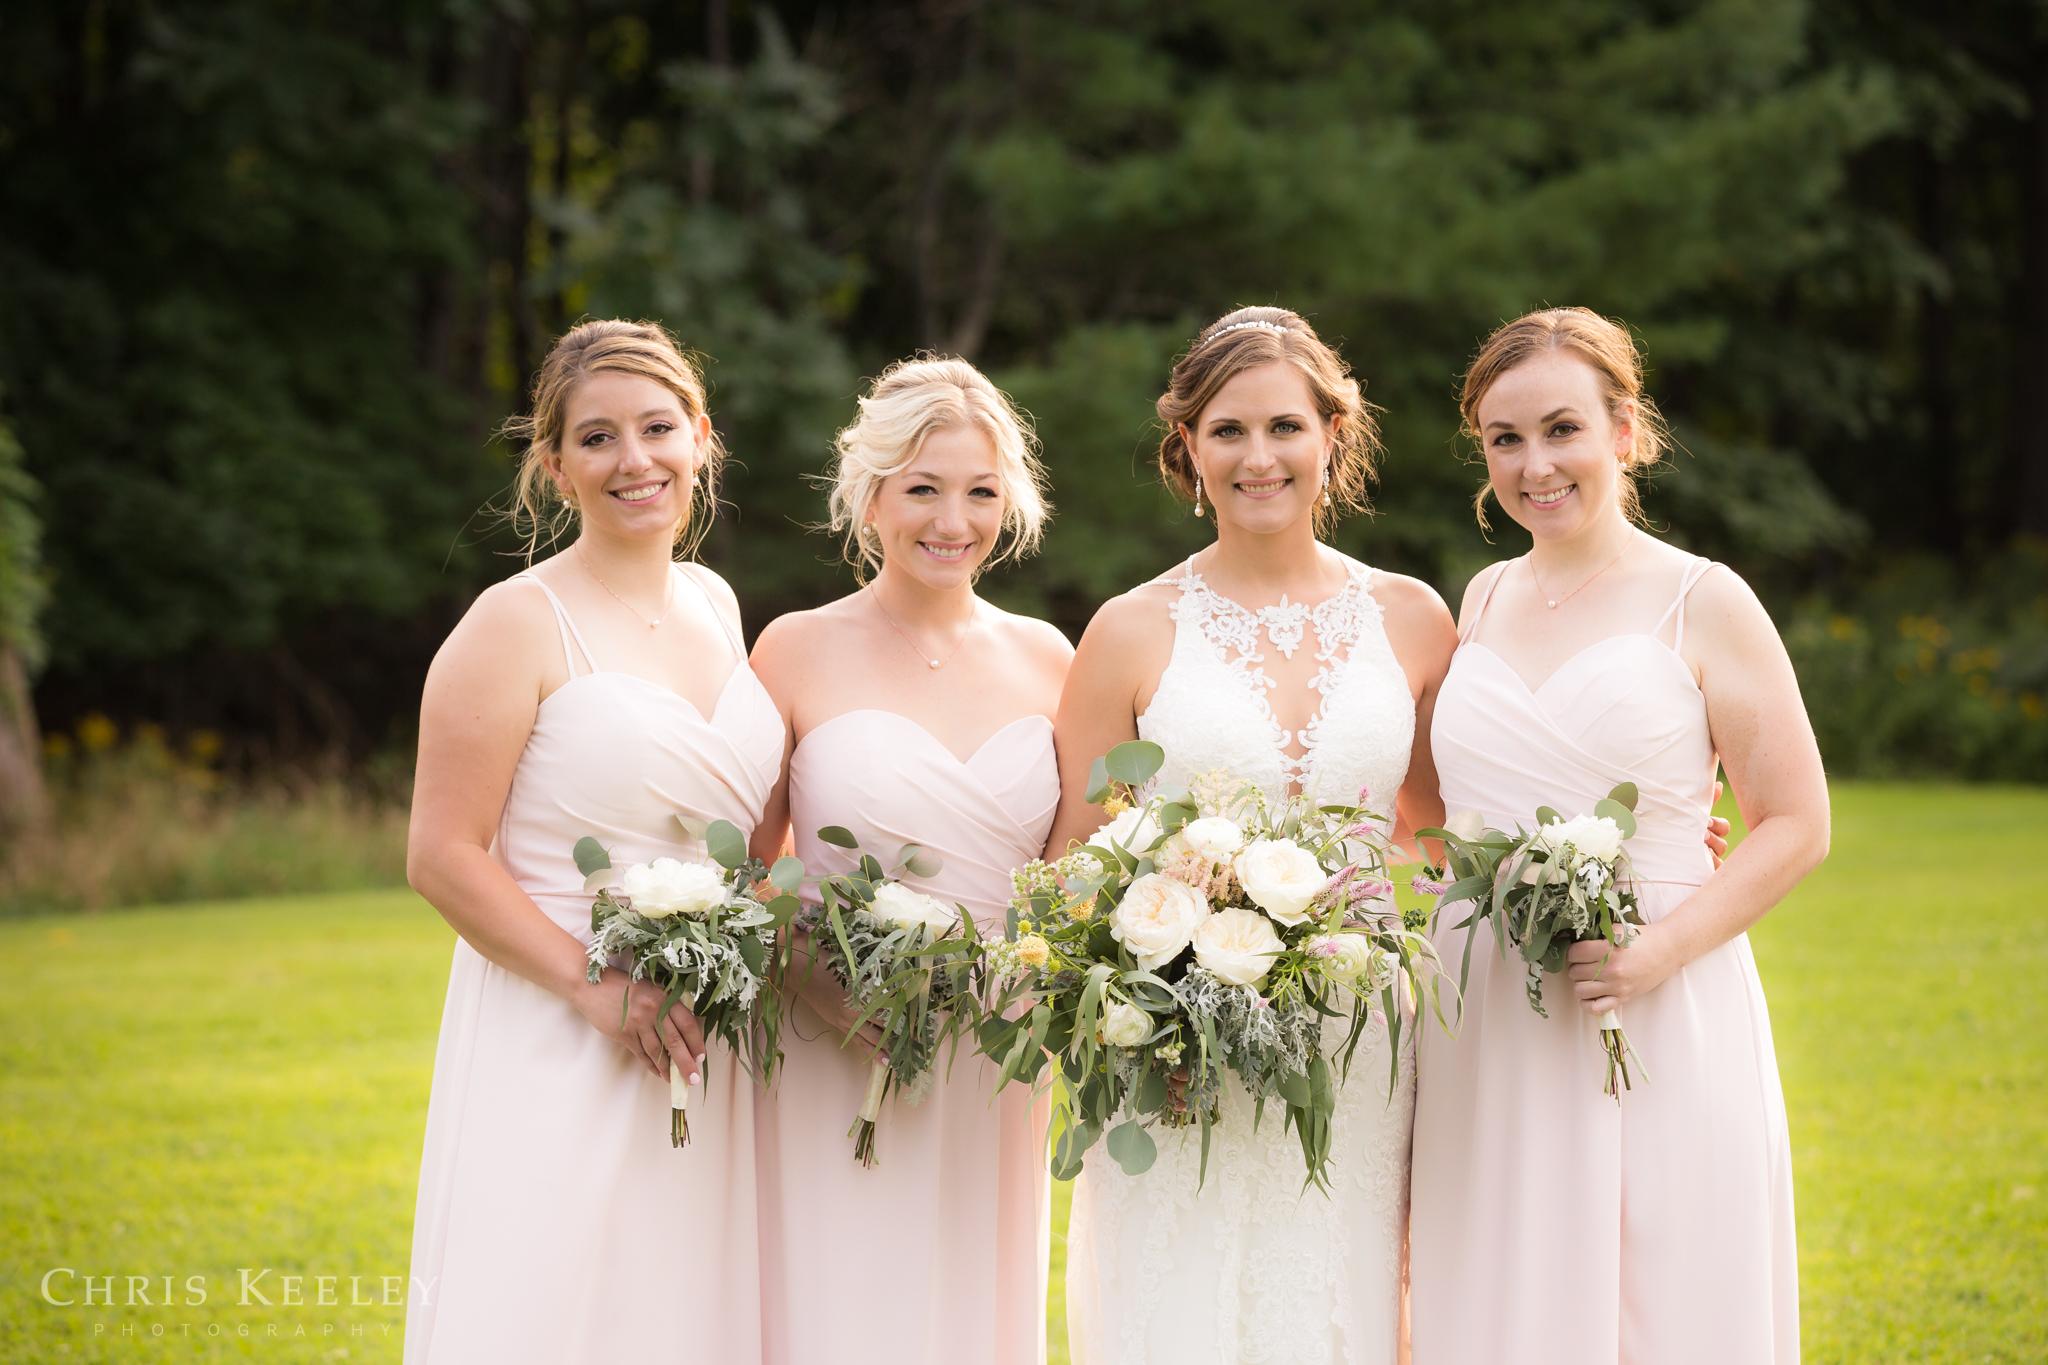 mombo-portsmouth-new-hampshire-wedding-photograper-46.jpg